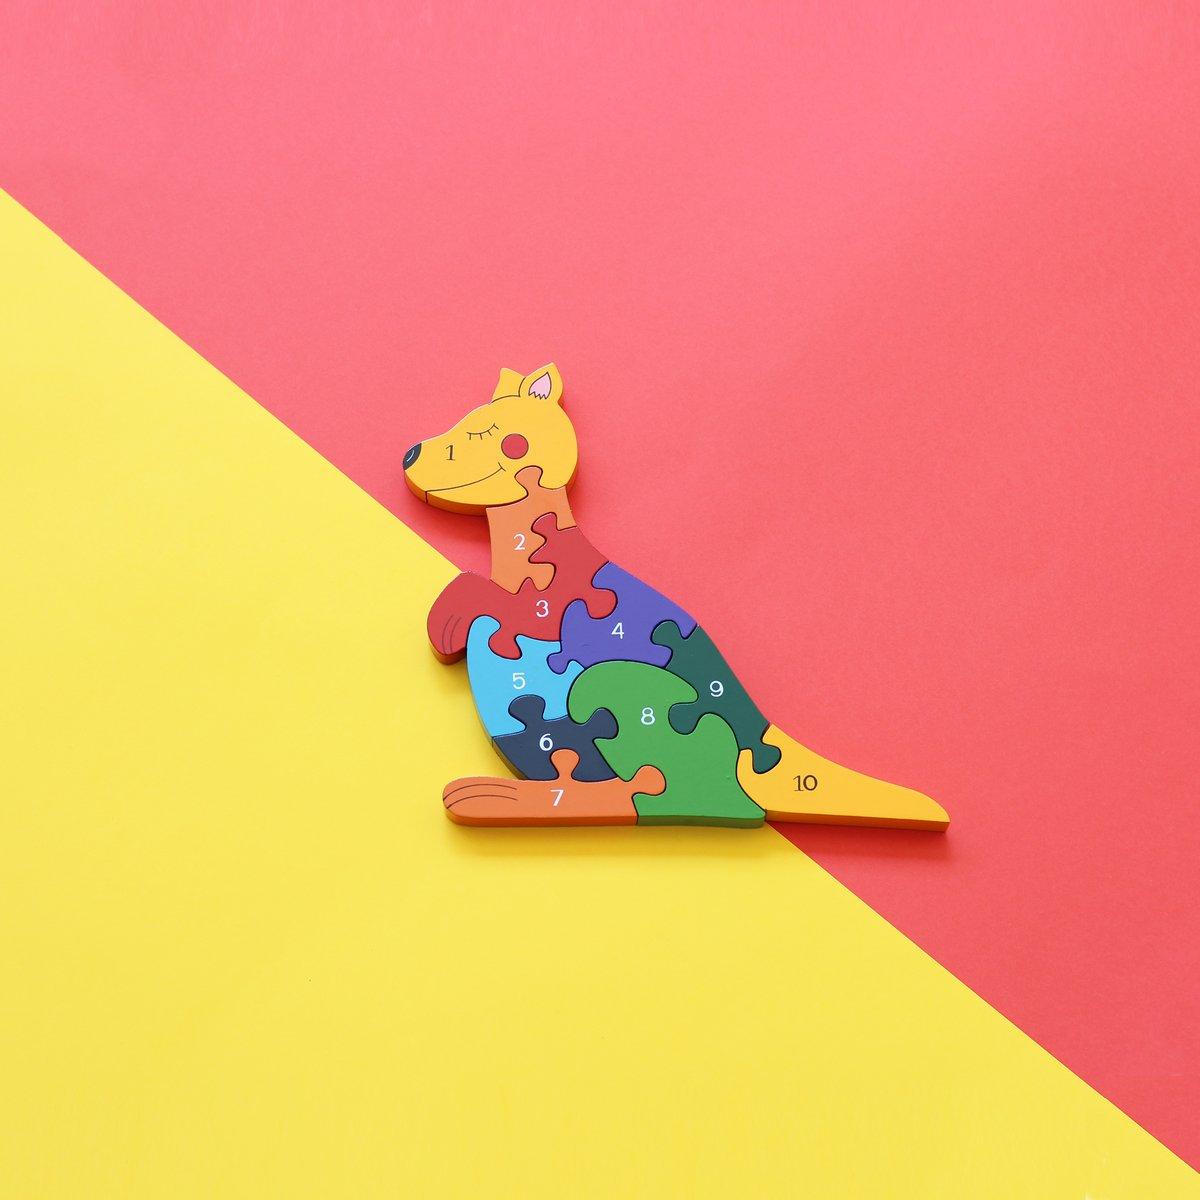 Image of Kangaroo 1-10